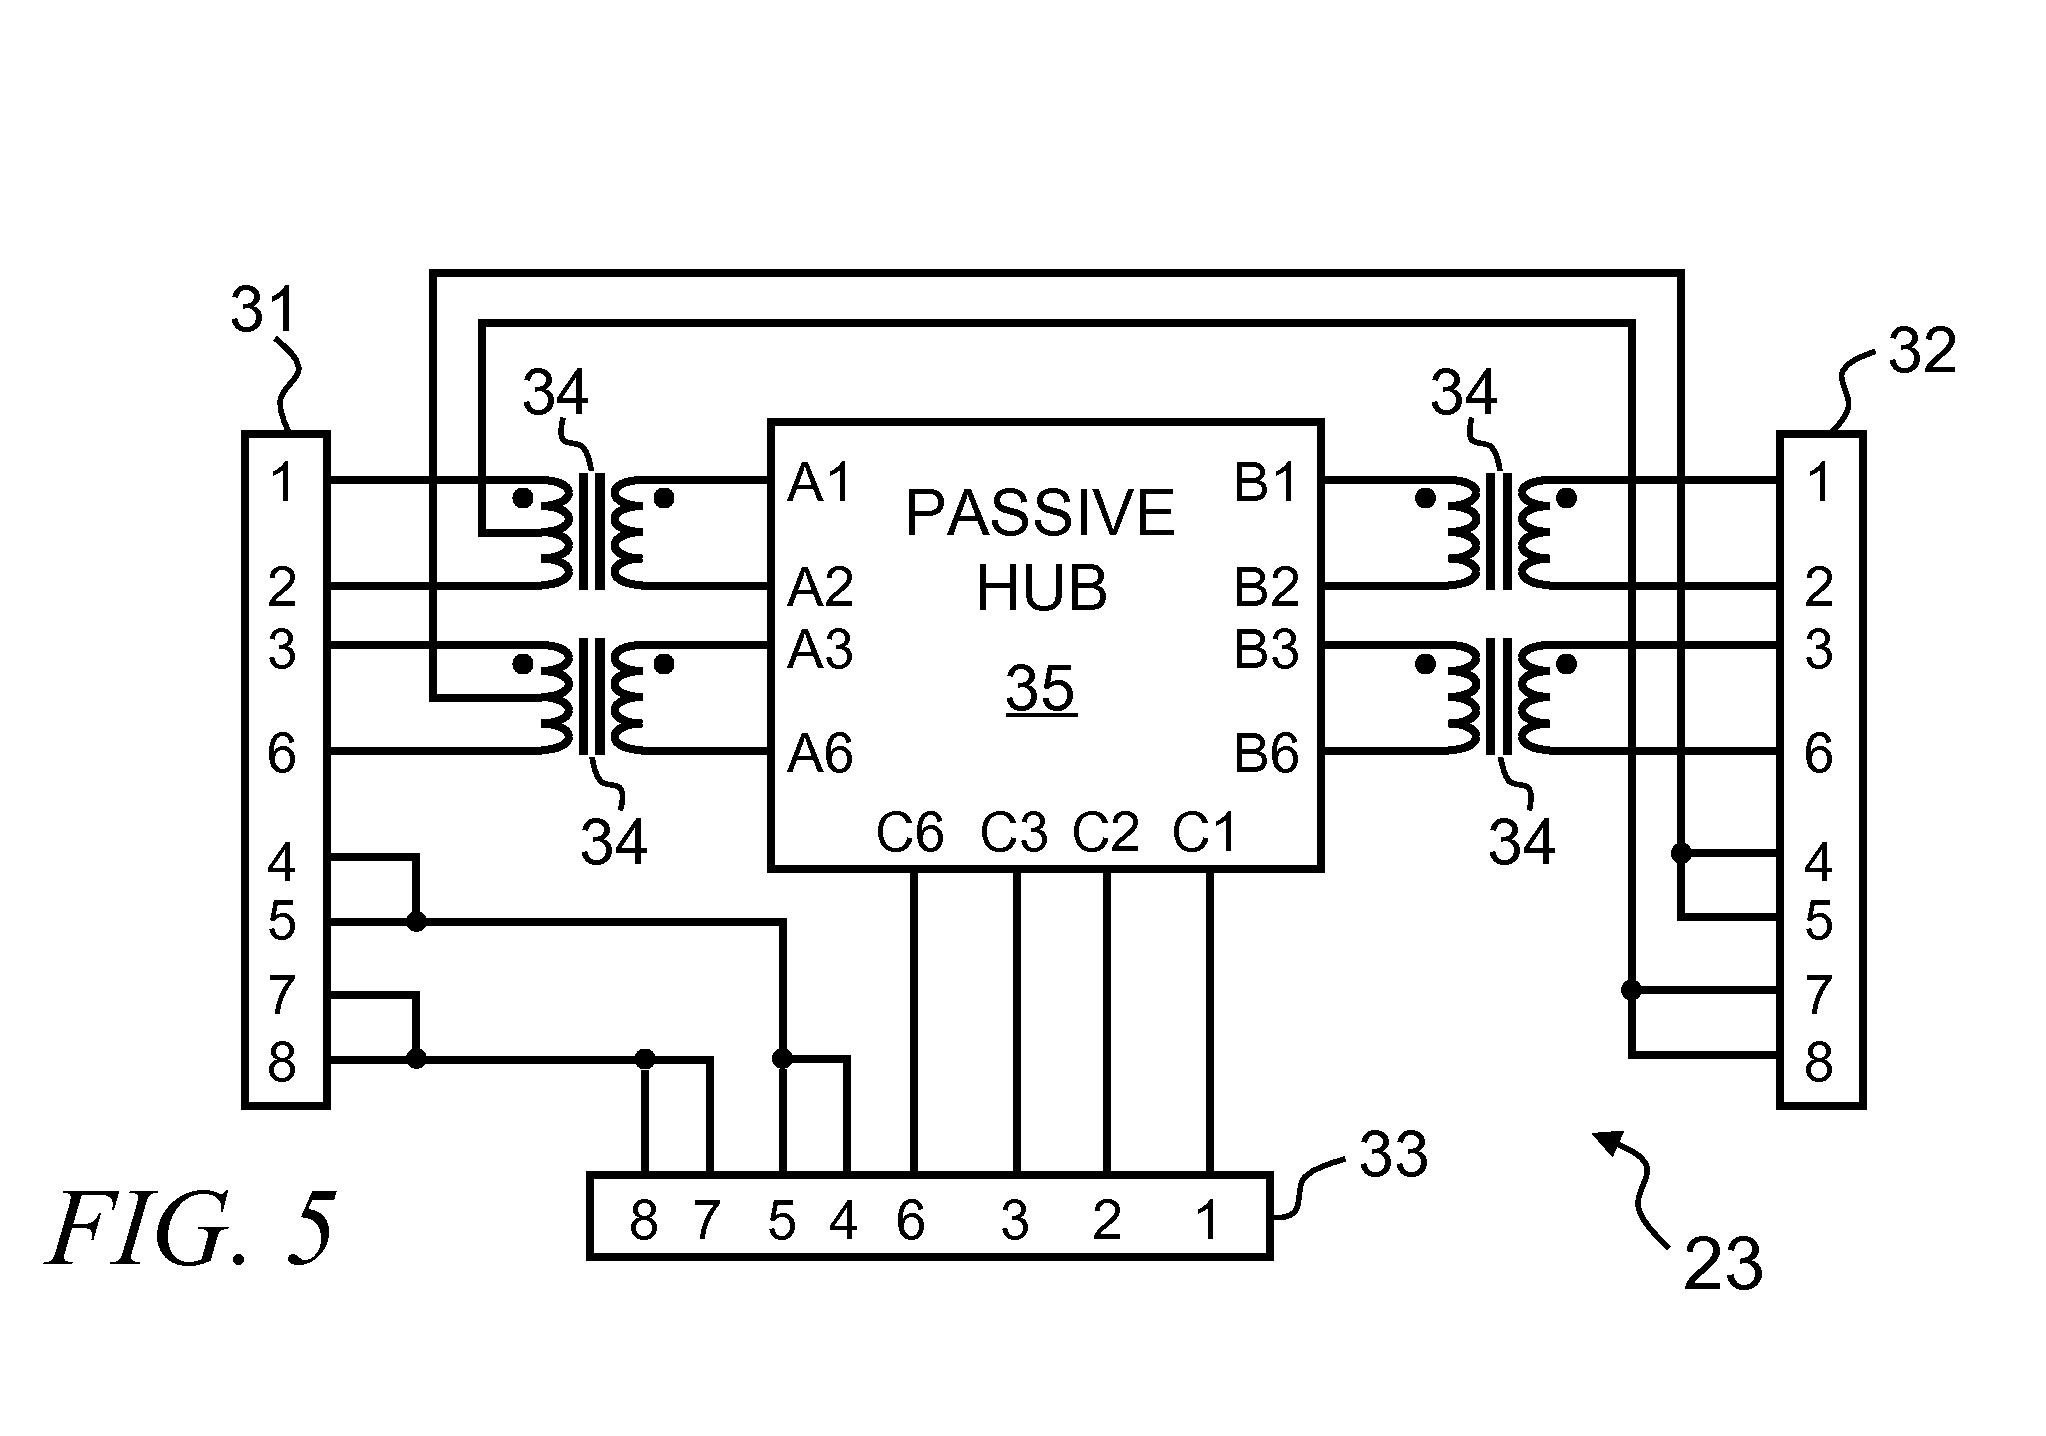 US20070288771A1 20071213 D00003?resize\\\\\\\\\\\\\\\\\\\\\\\\\\\\\\\=665%2C467 trim tab wiring diagram gandul 45 77 79 119 Electric Fan Relay Wiring Diagram at gsmx.co